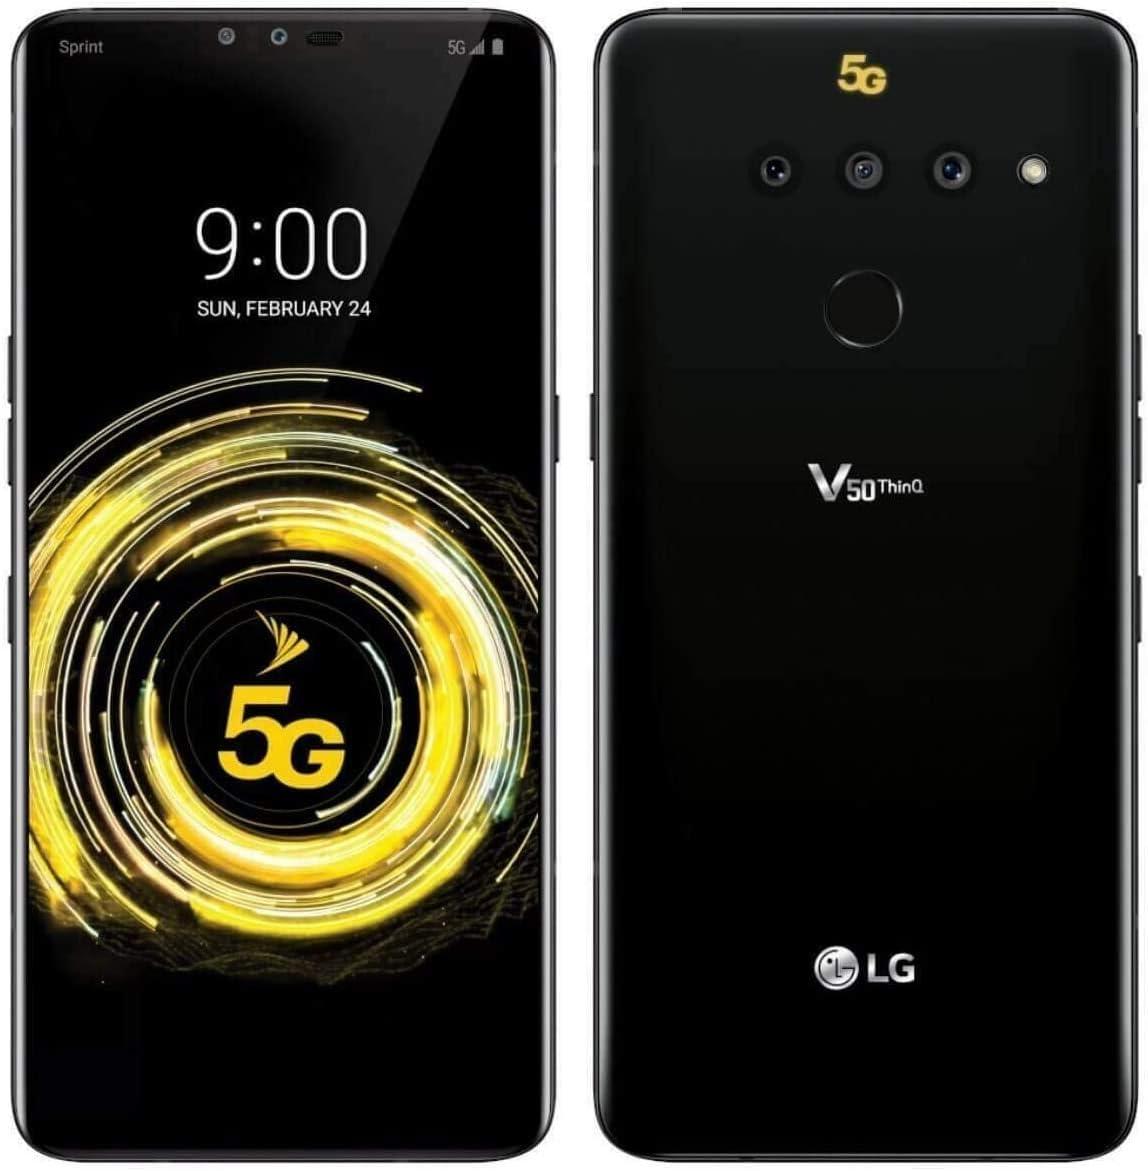 Amazon.com: LG V50 ThinQ 128GB LMV450PM Sprint CDMA and GSM Unlocked 5G  Smartphone Aurora Black